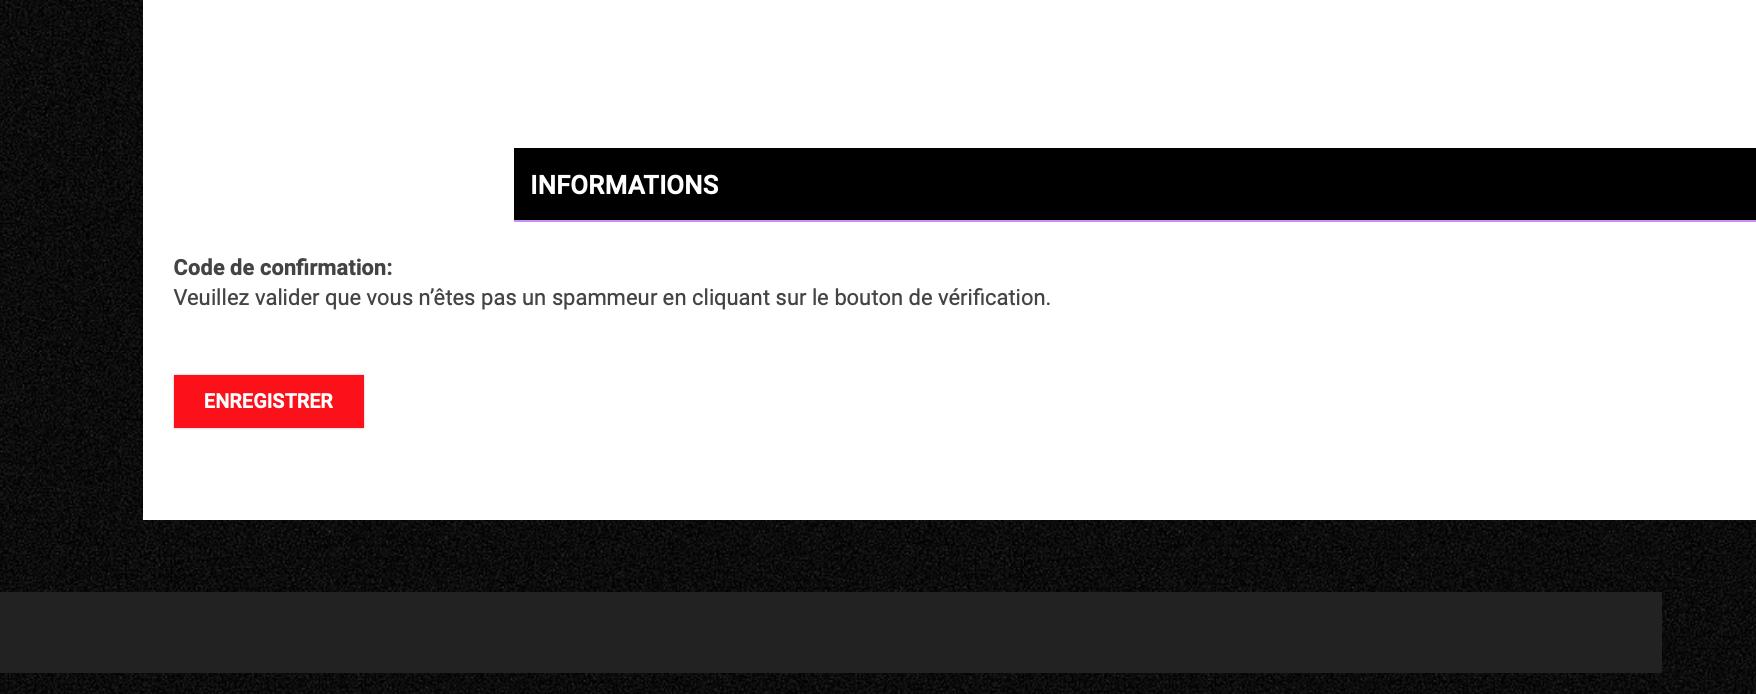 Problème affichage du bouton anti-spamm 190127020333300742